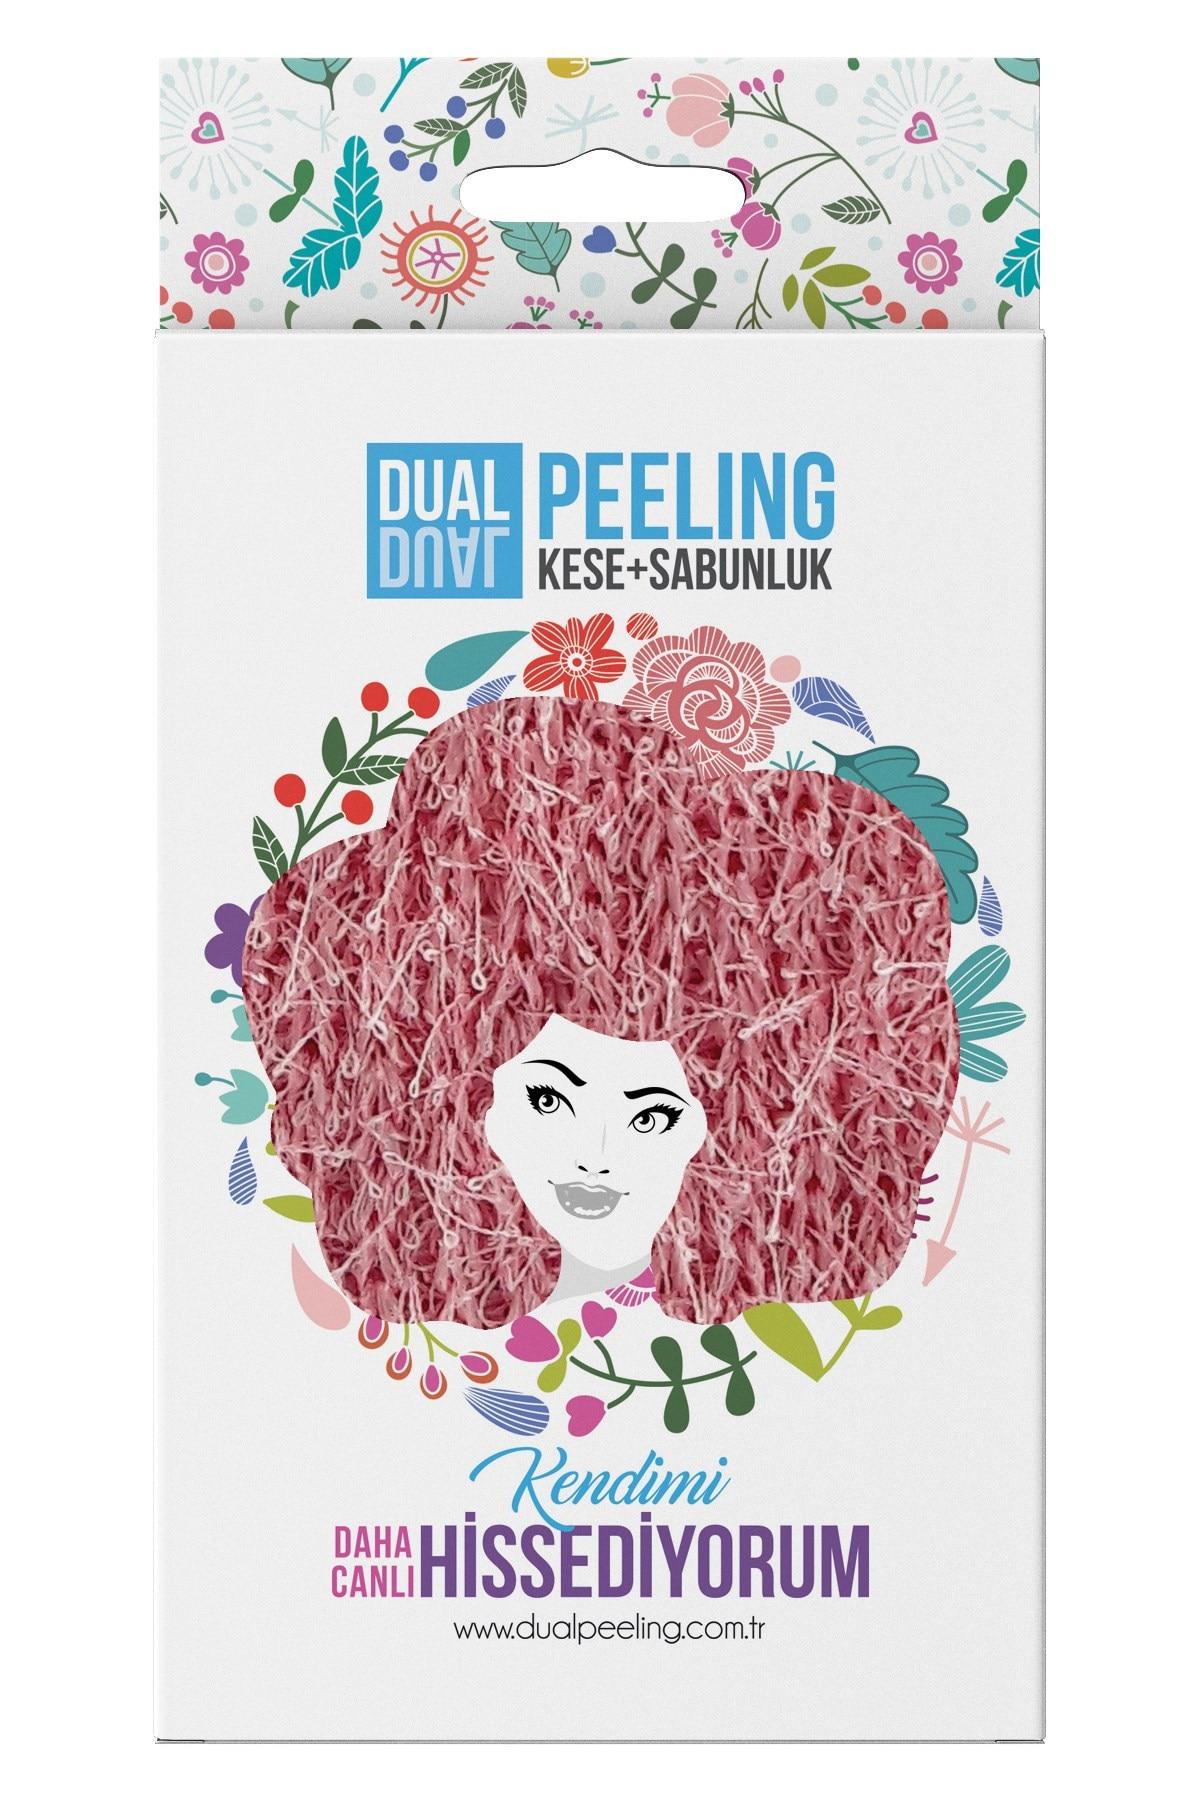 Dual Peeling Exfoliating Bath Mitt 100 Floss + Soap Glove 100 Polyester